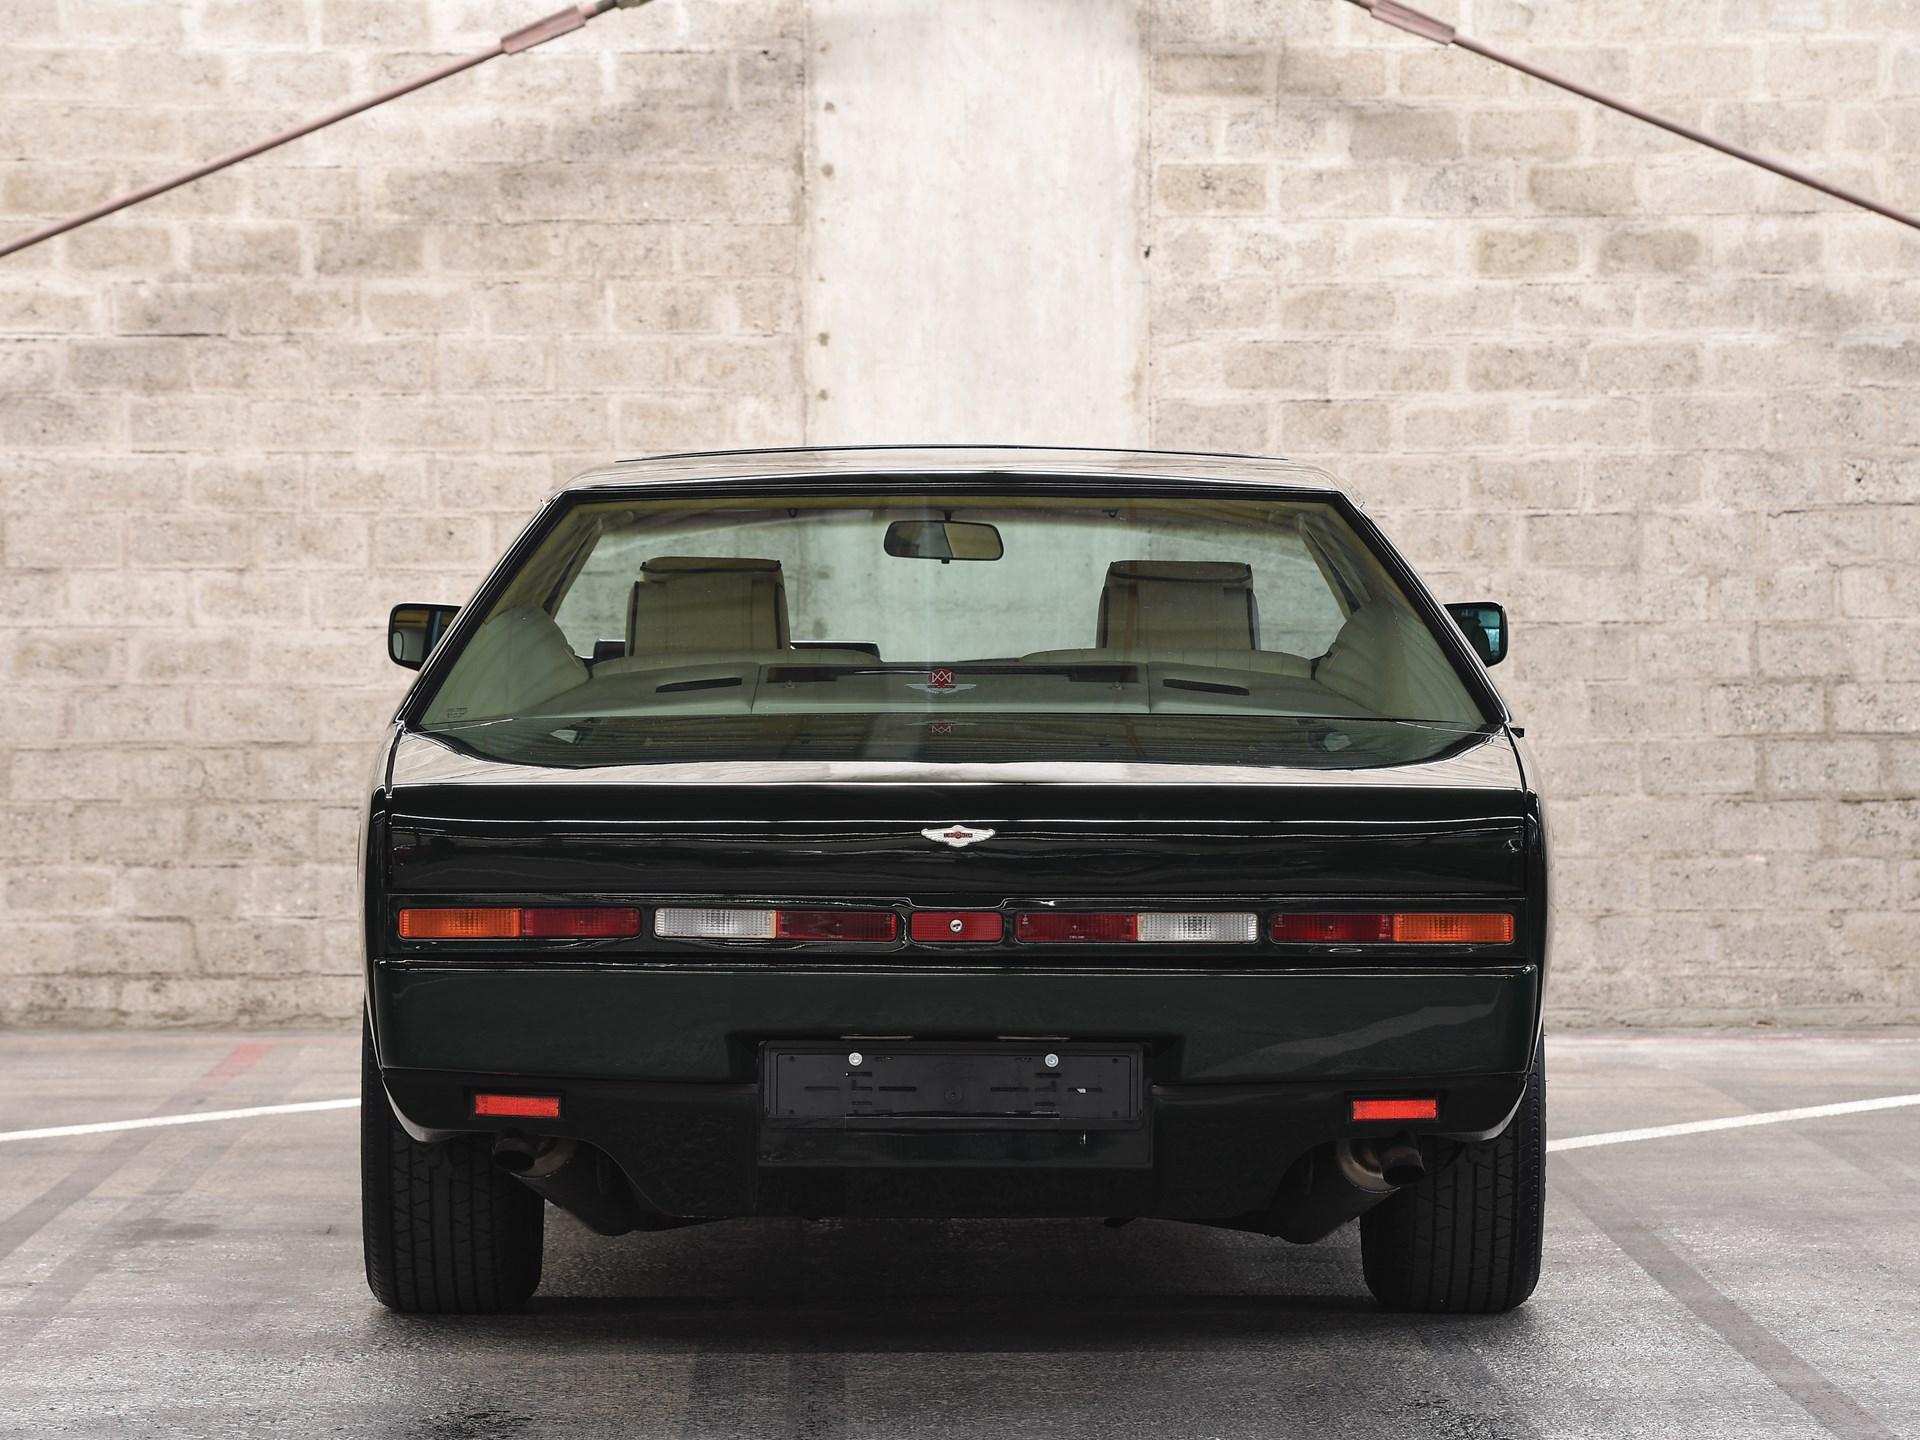 1989 Aston Martin Lagonda Series 4 rear end